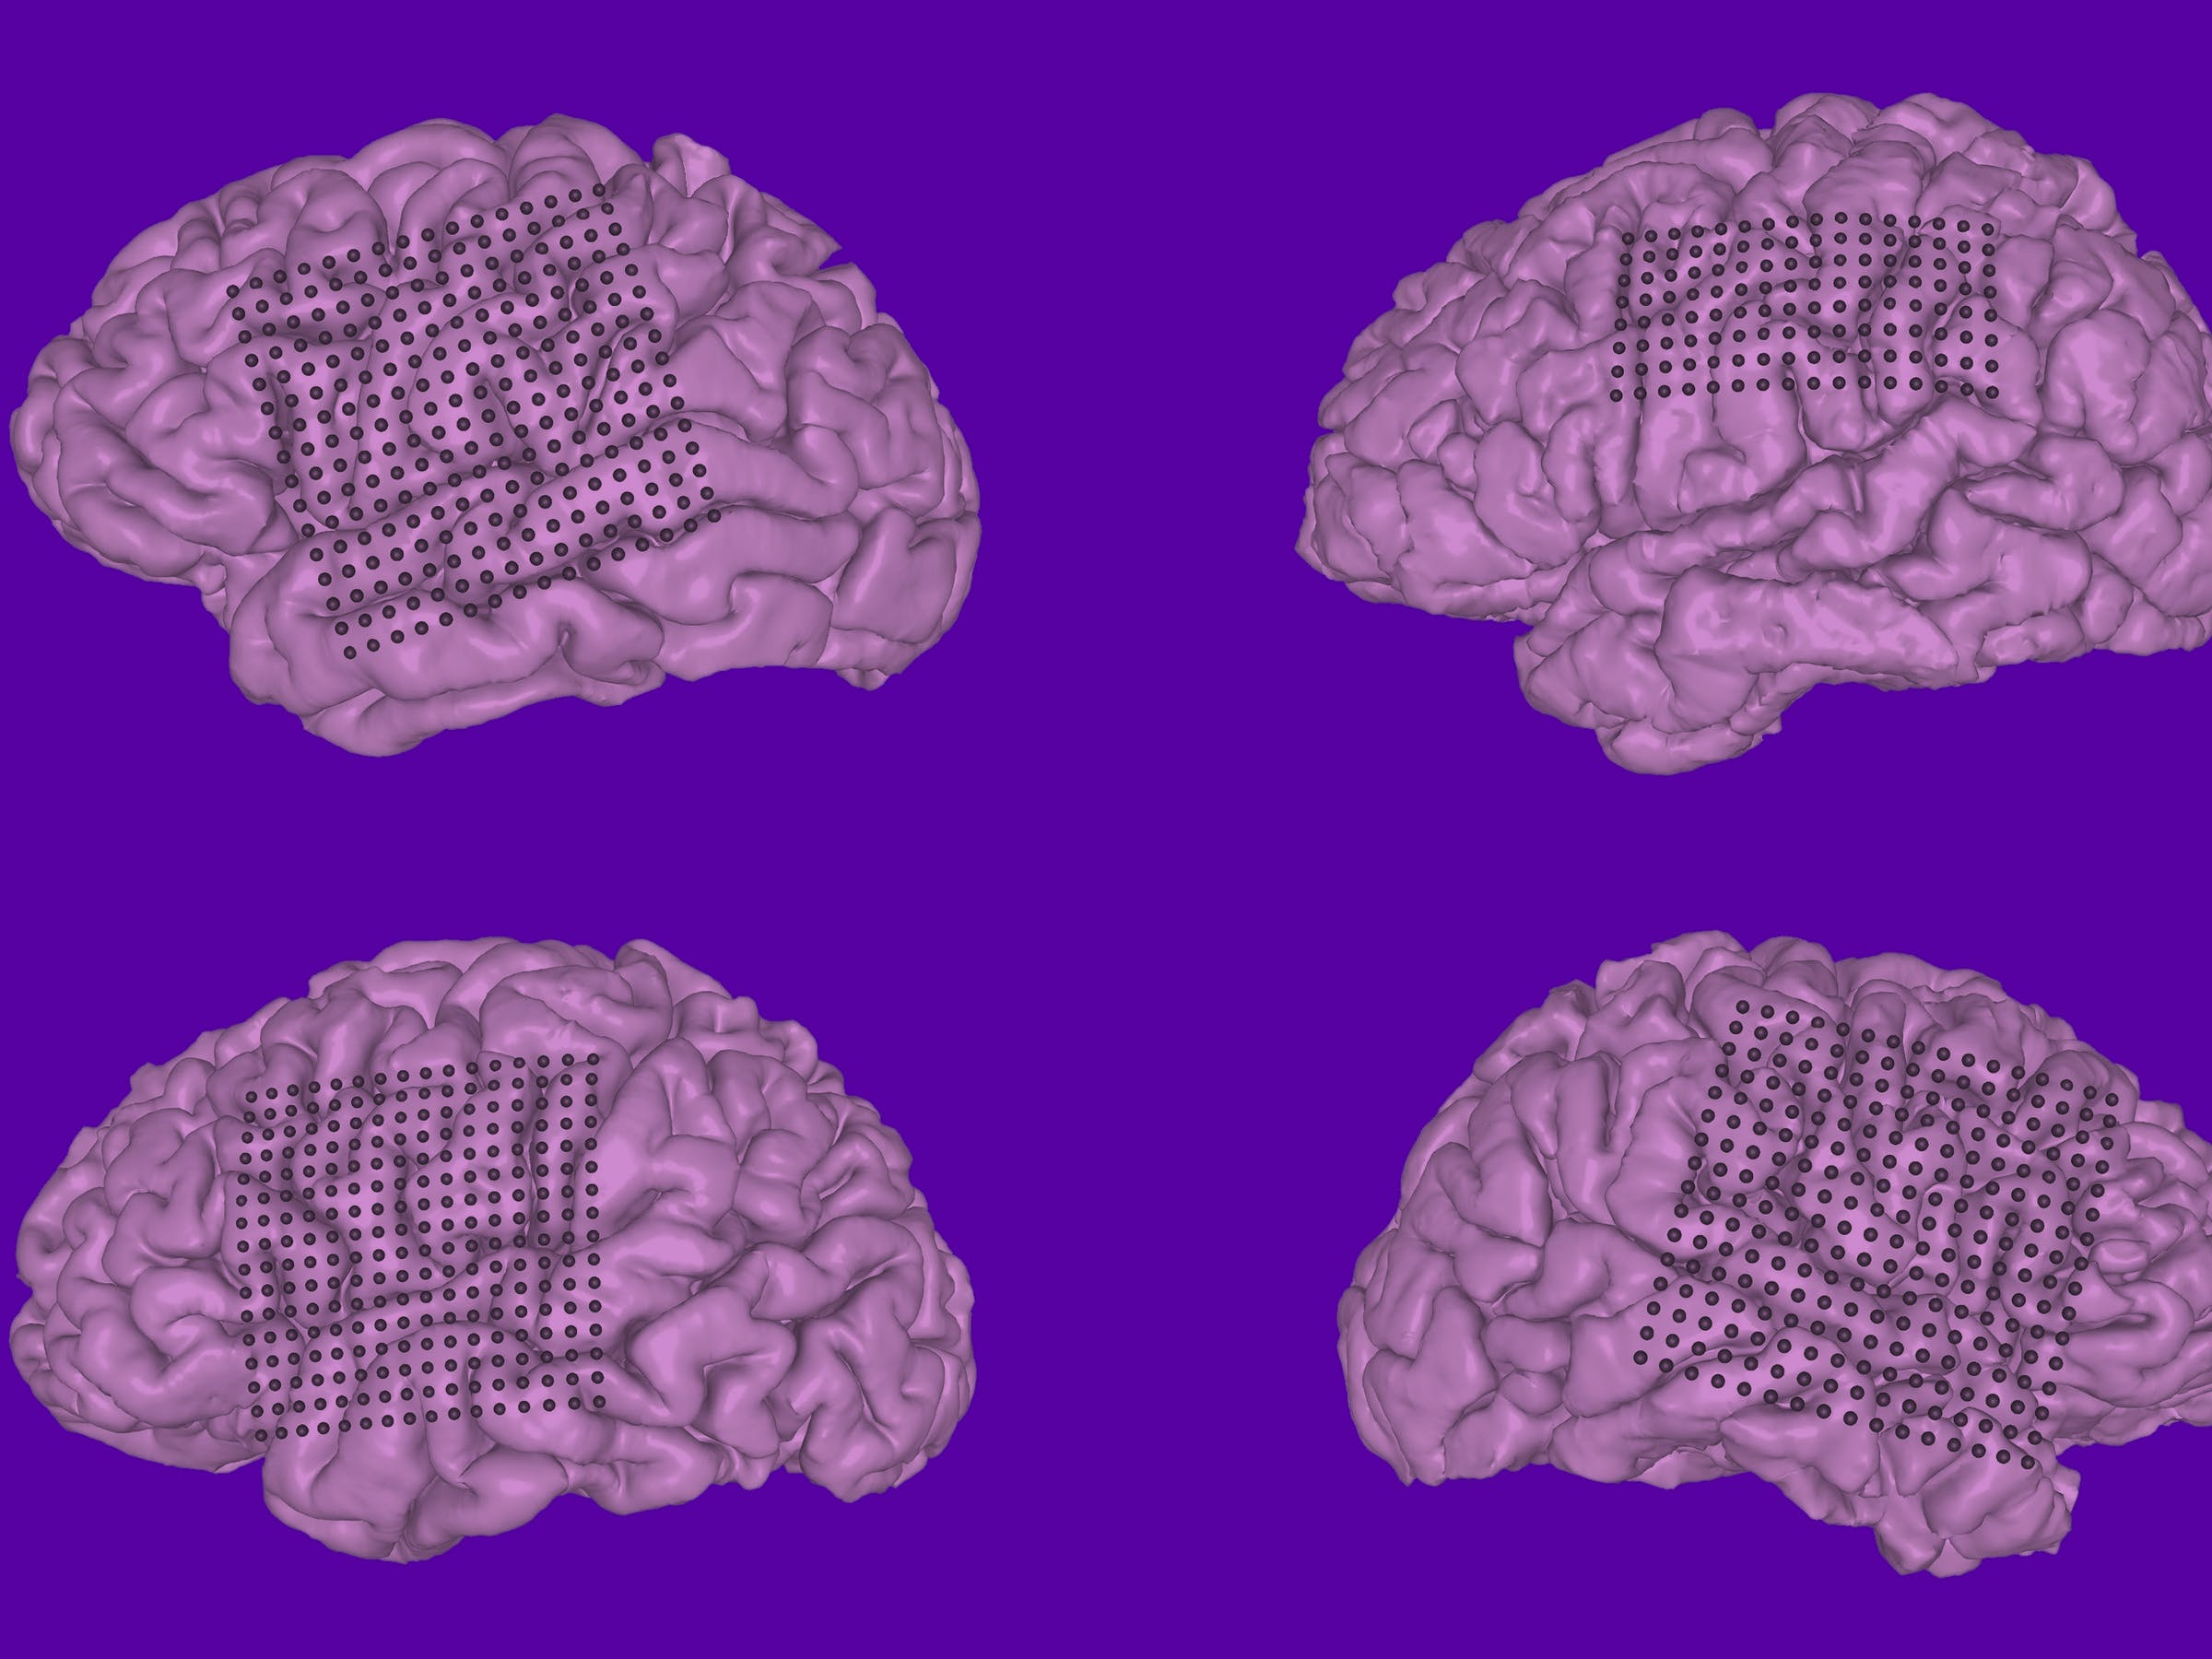 Neuroprosthetics: Doctors Decode Human Speech From Brain